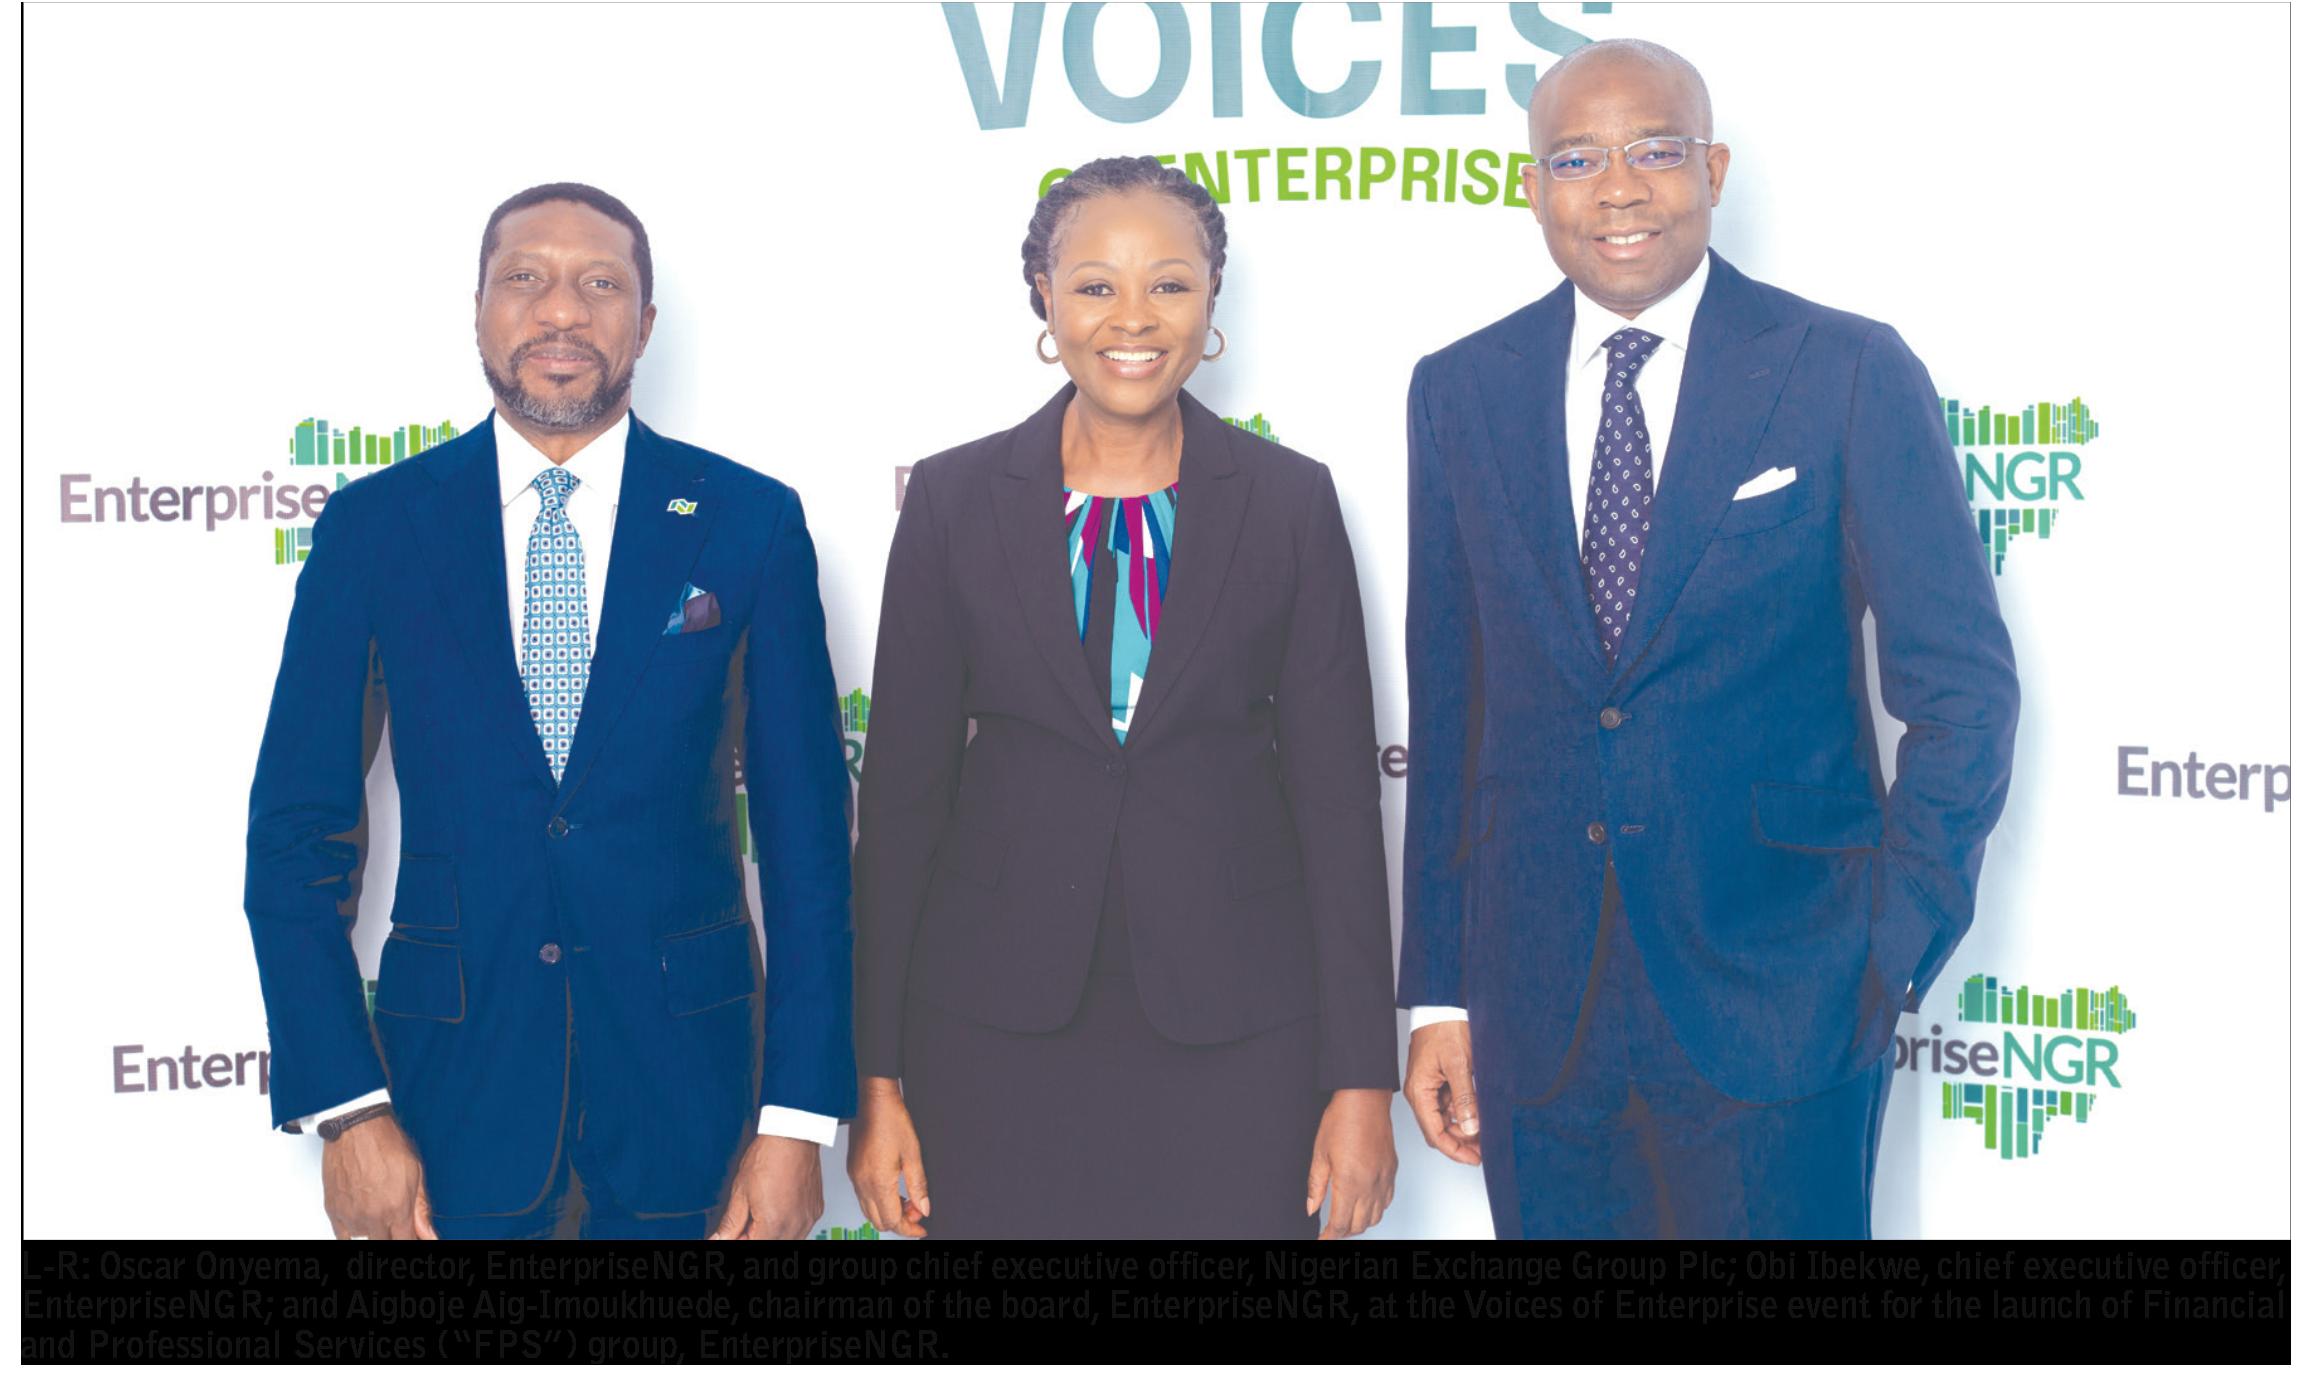 Nigeria on fiscal cliffhanger over revenue gap, expenditure shortfalls